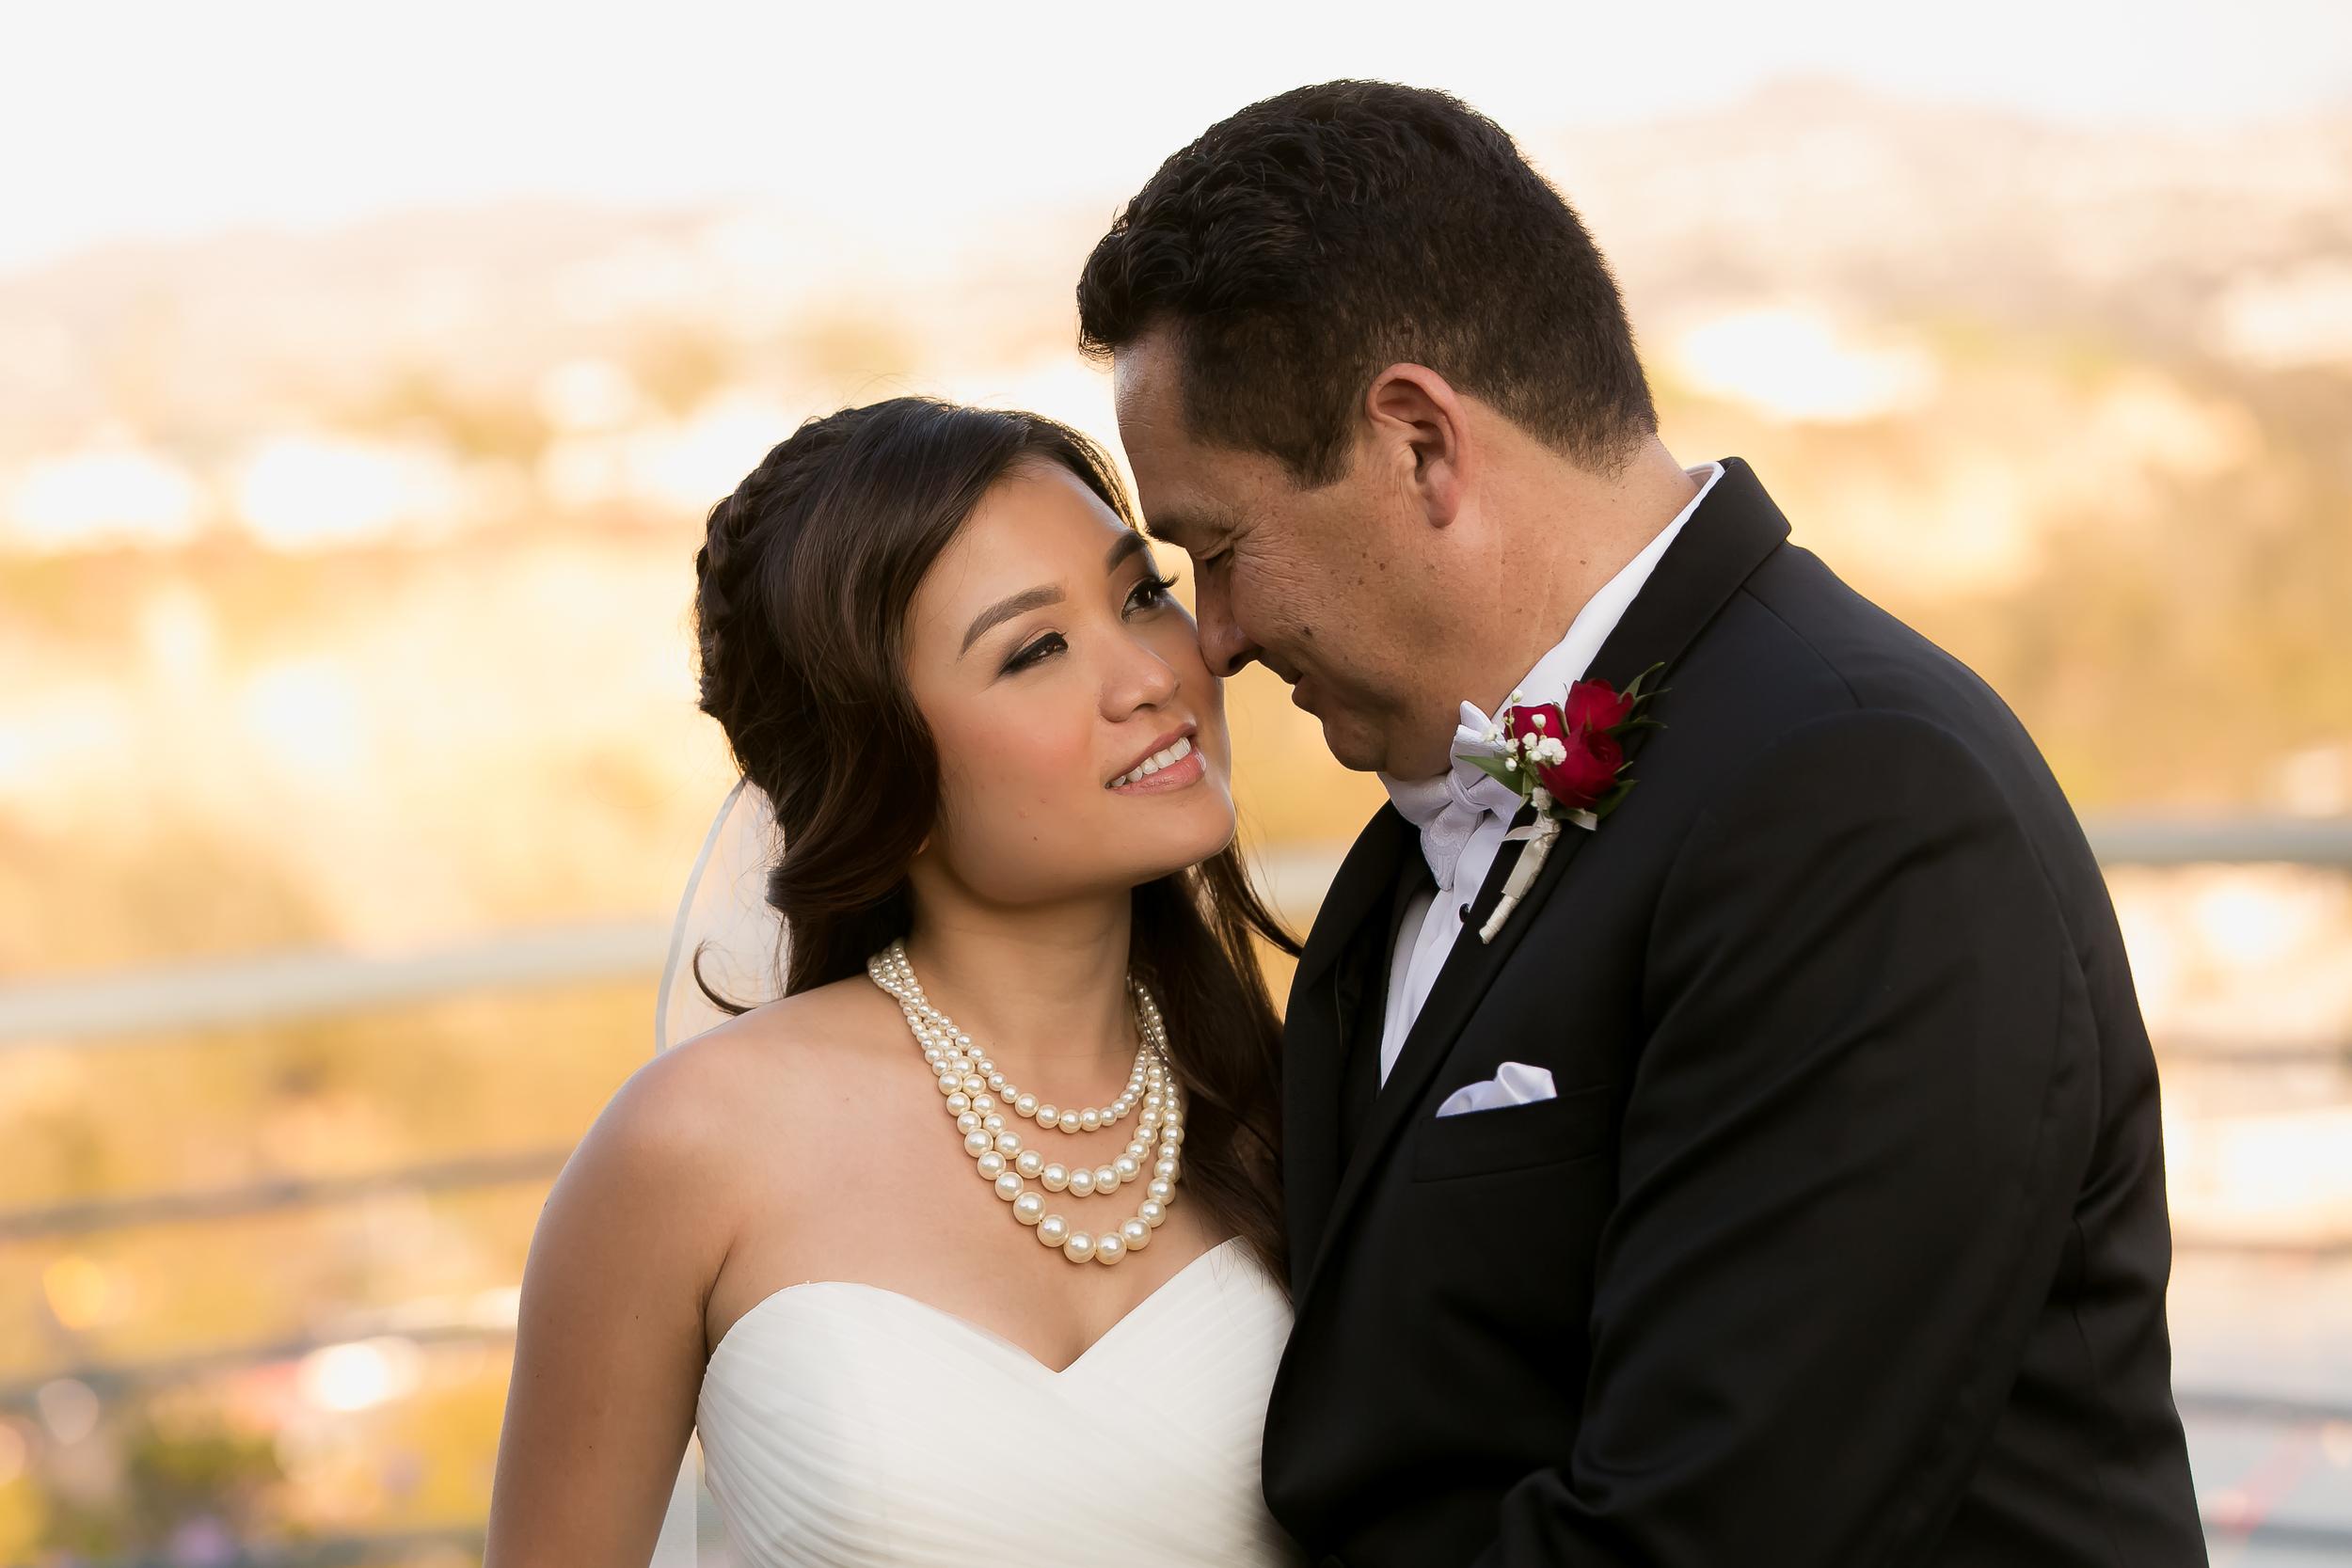 Dana-Point-Wedding [Preview]-0002.JPG